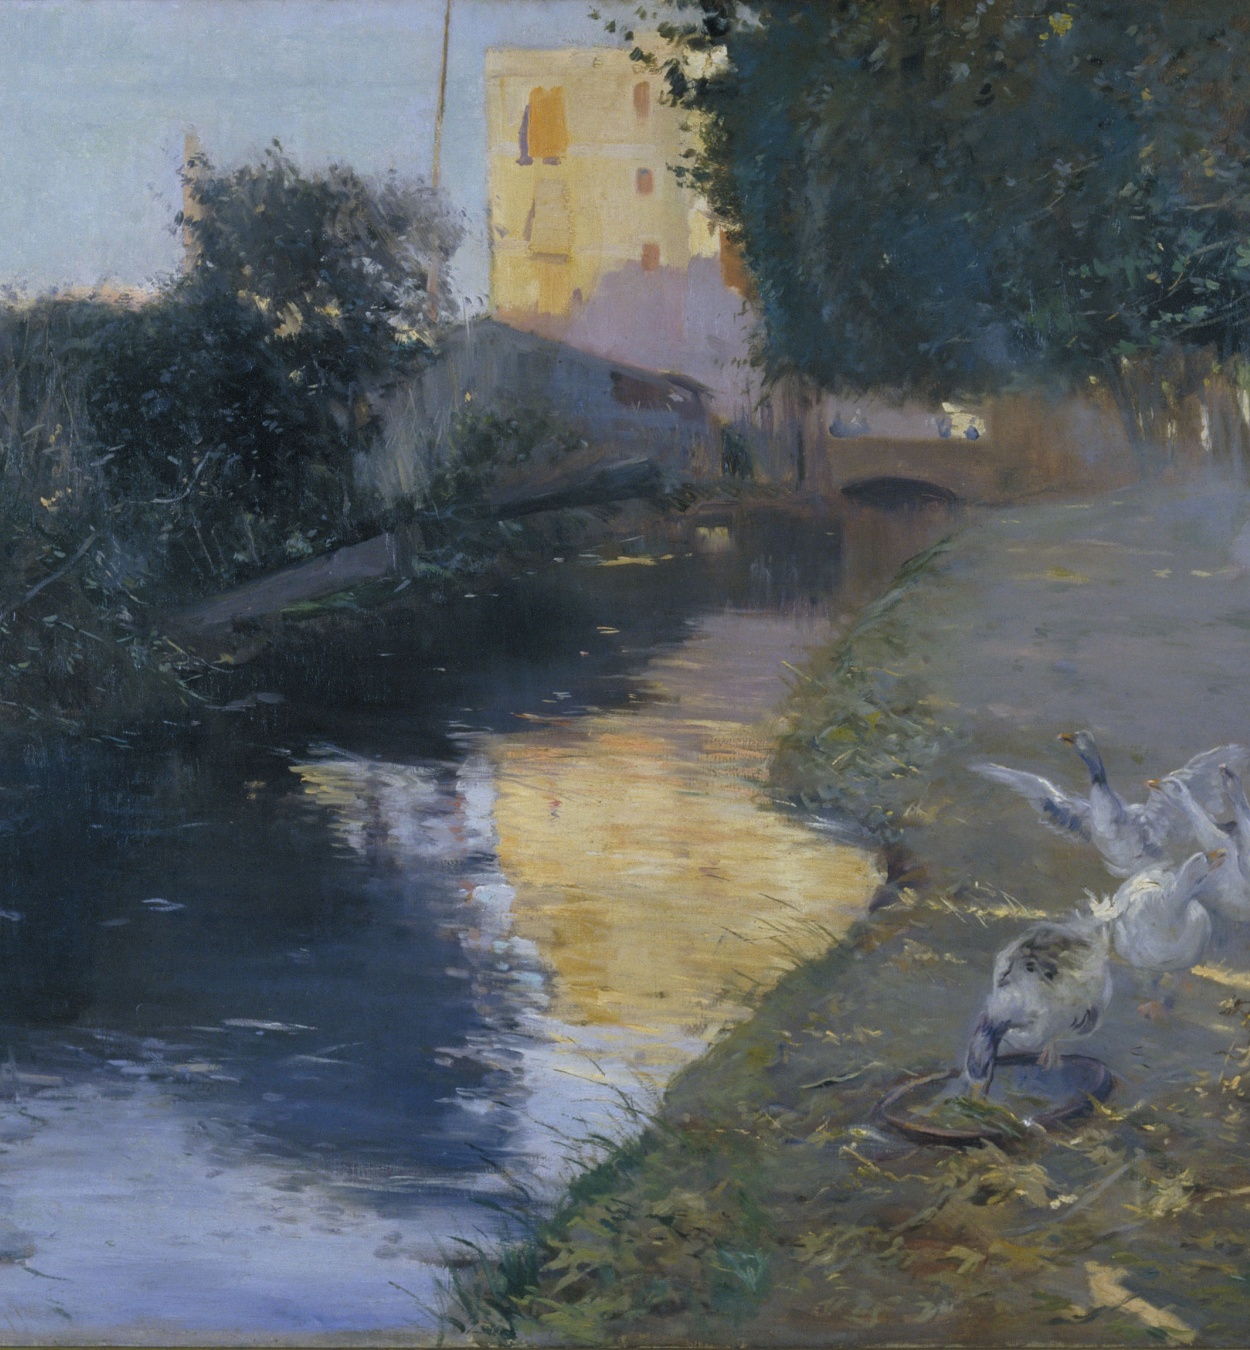 Joaquim Mir - The Ditch - 1897